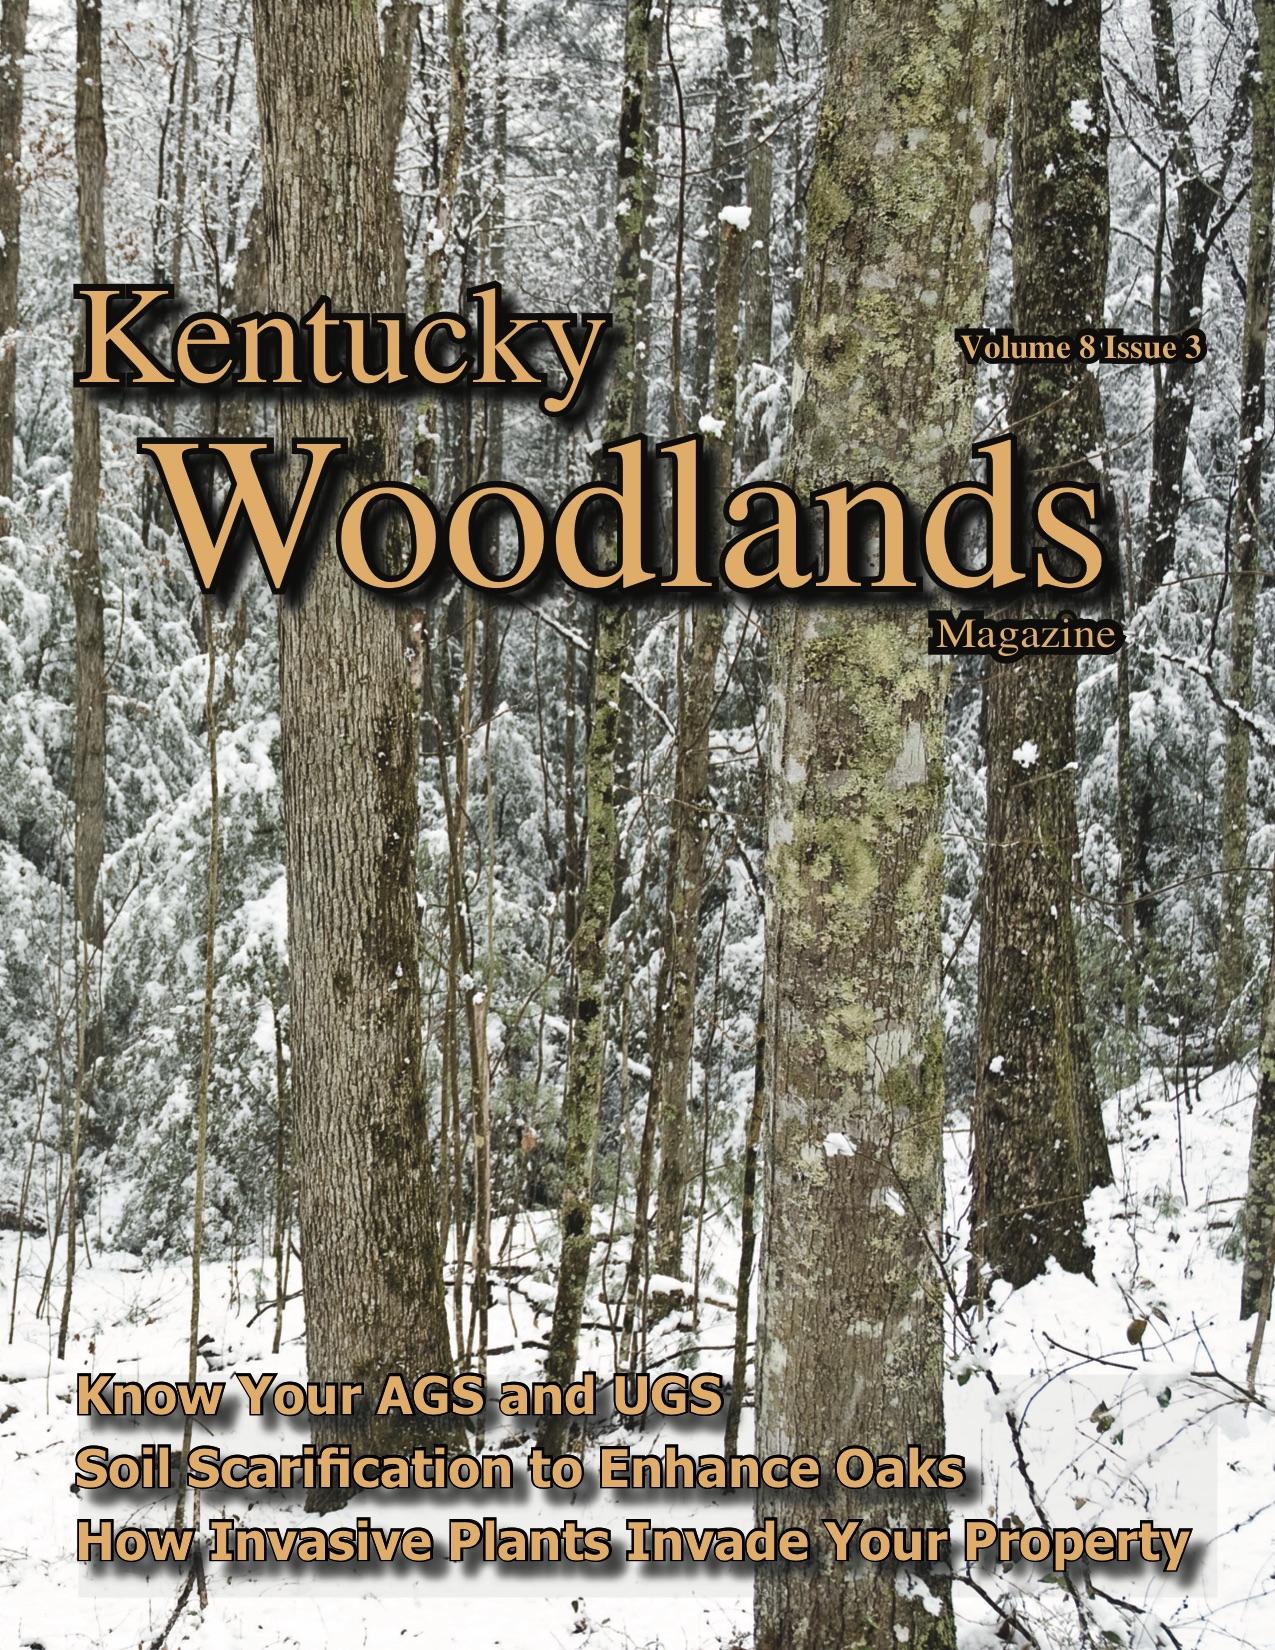 Kentucky Woodlands Magazine